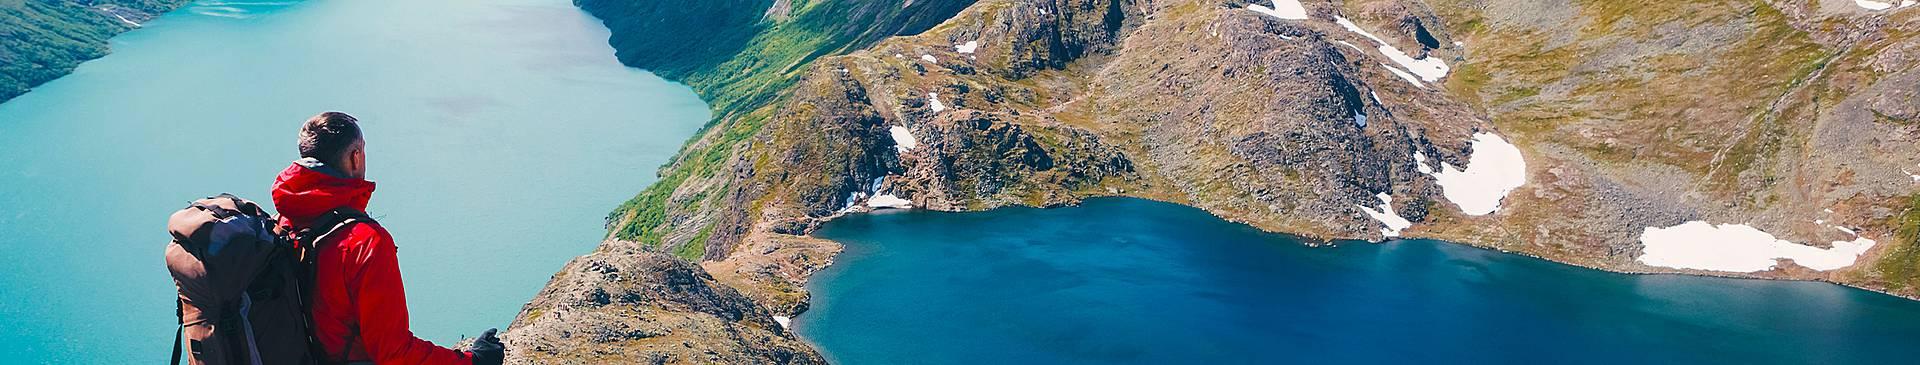 Circuits Rando et Trek en Norvège